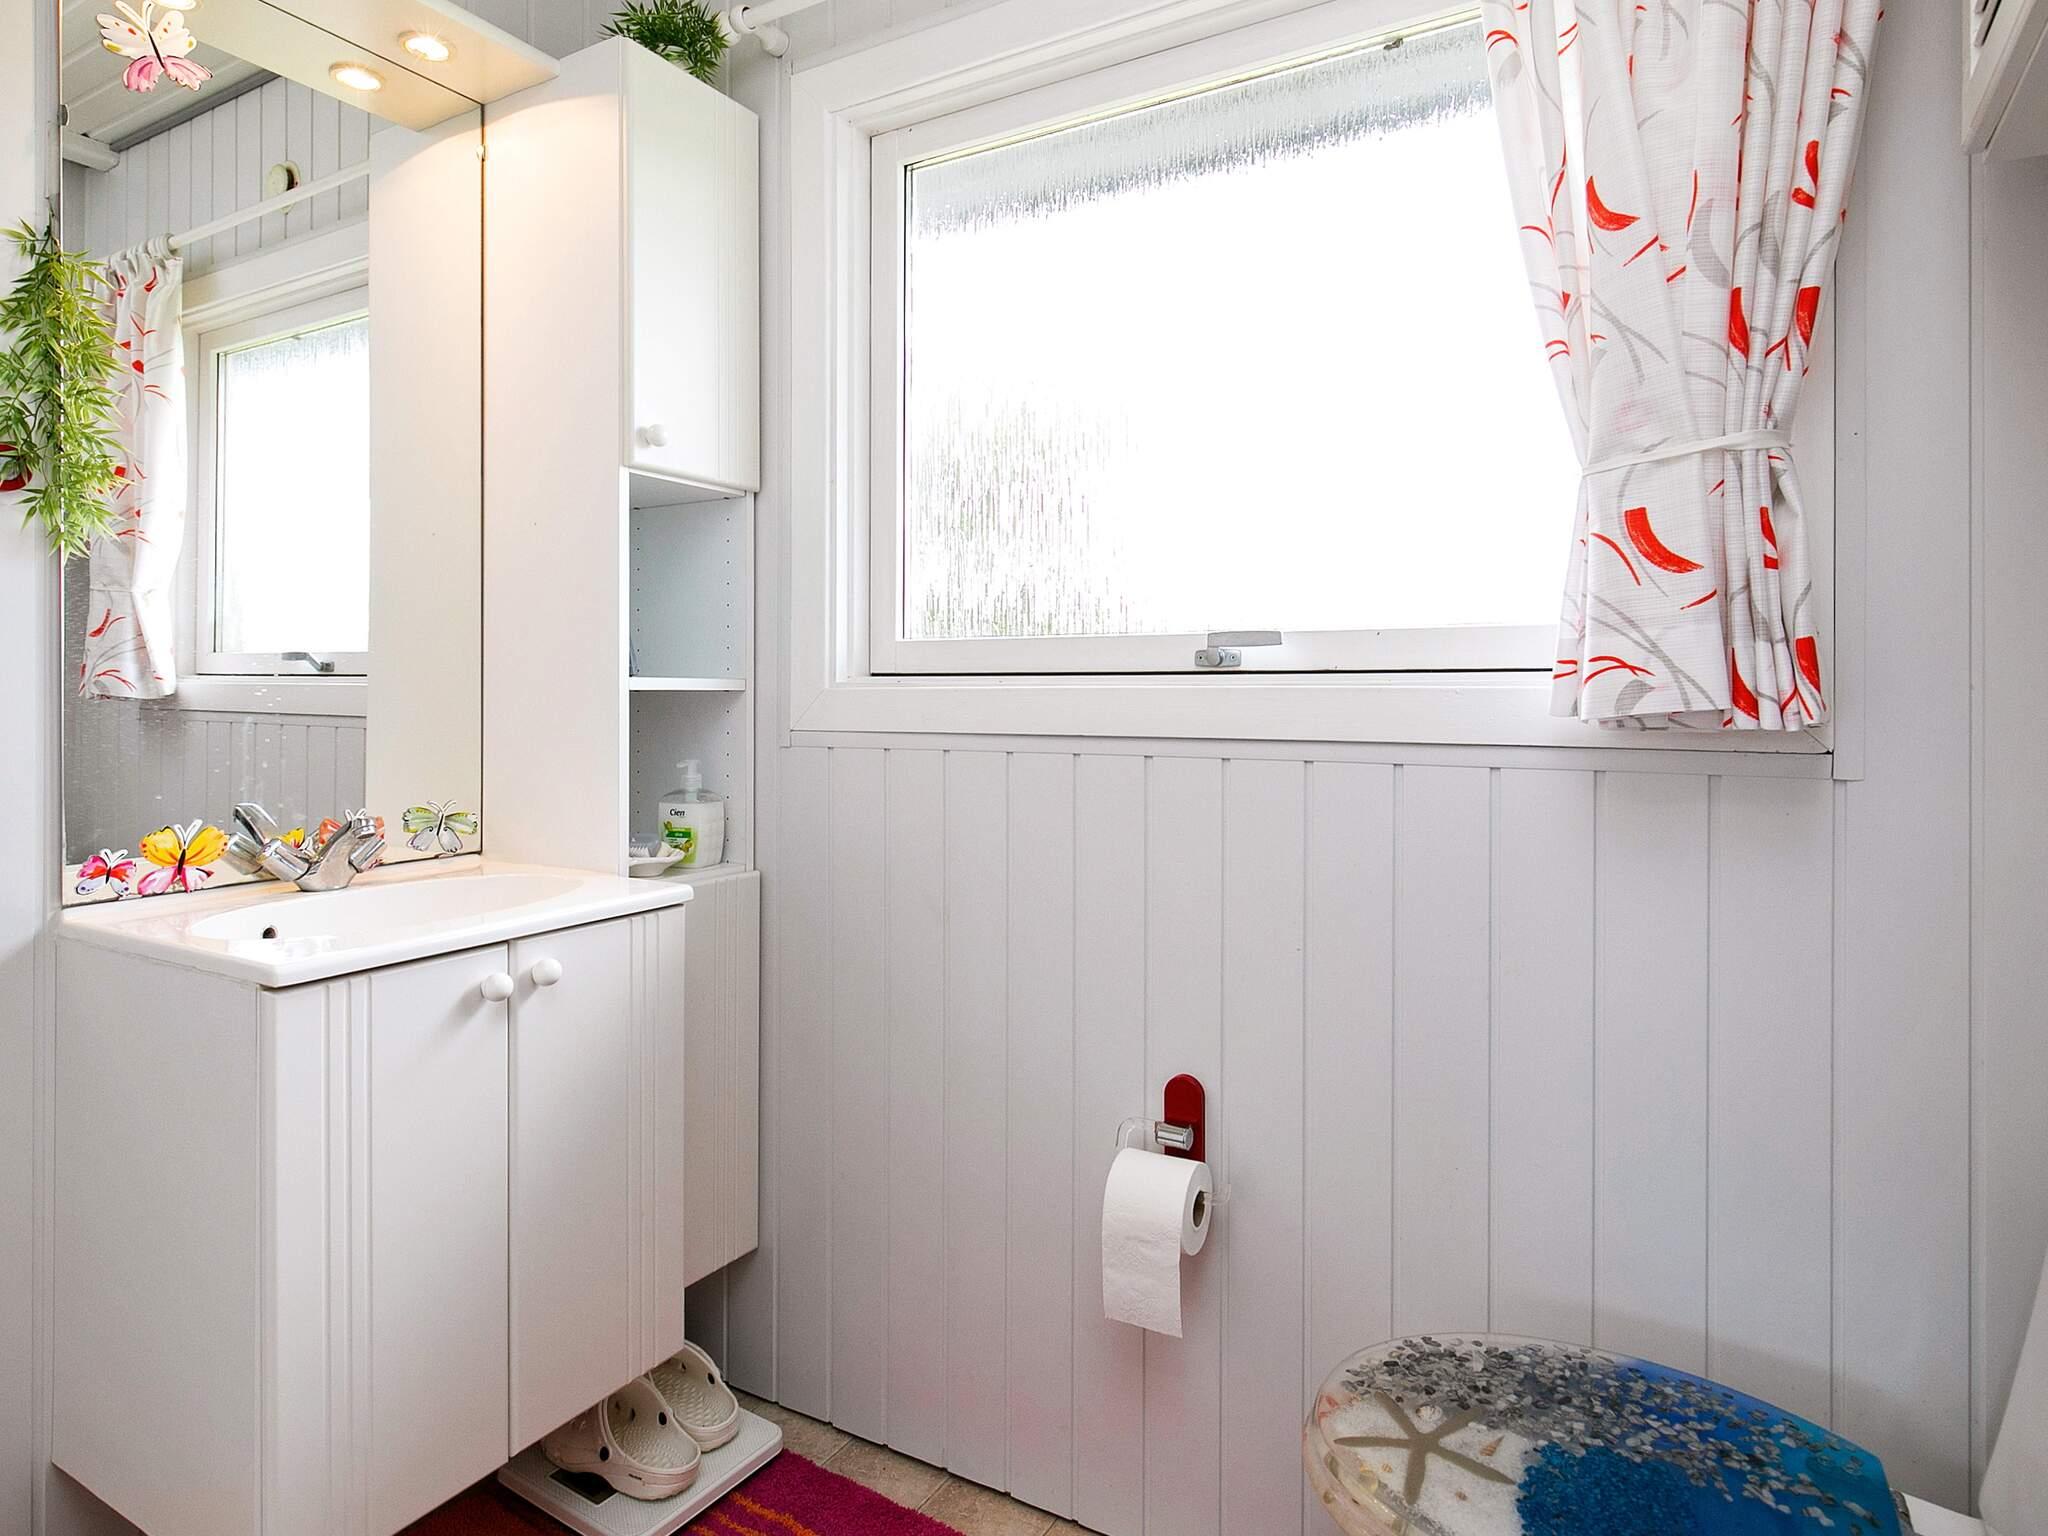 Maison de vacances Eskov Strandpark (610274), Roslev, , Limfjord, Danemark, image 14